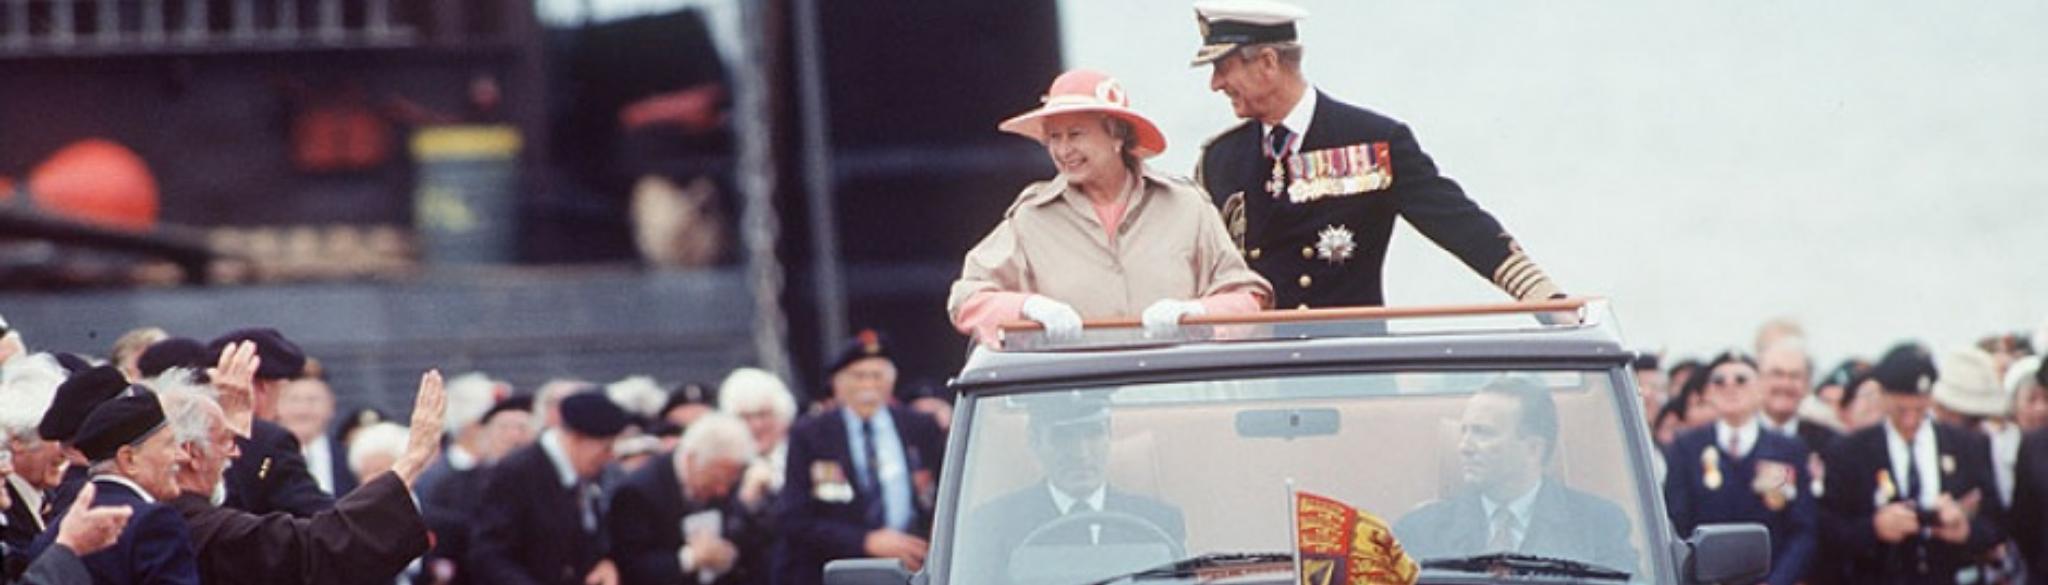 Royal Family Land Rover